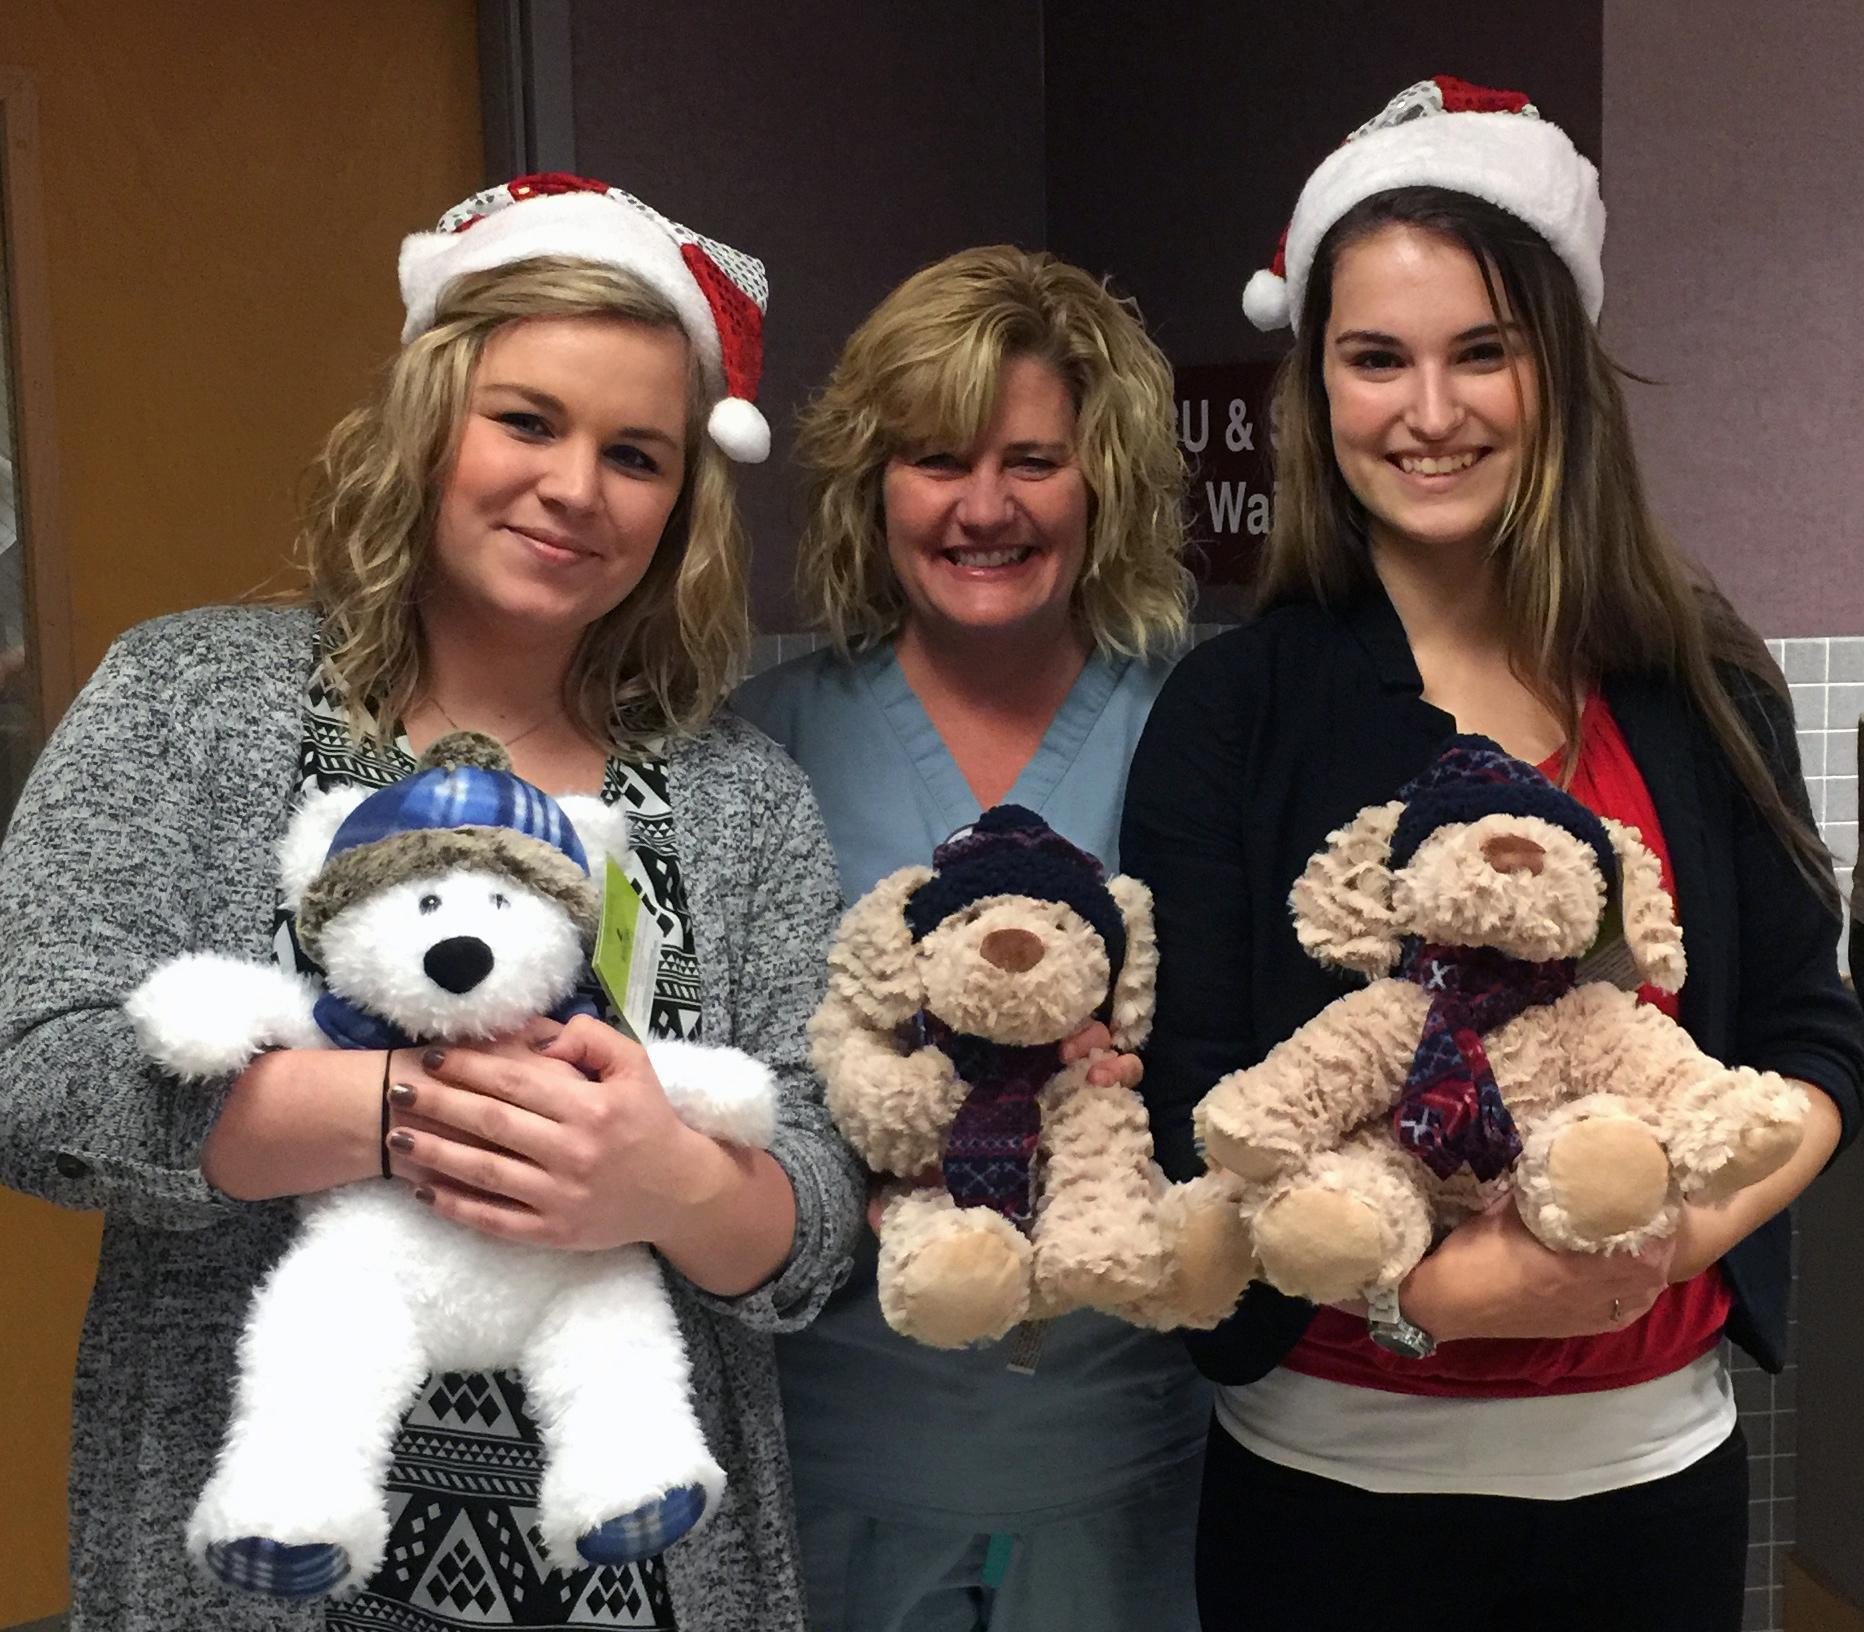 Kay Jewelers Christmas Bear 2020 Kay Jewelers donates stuffed animals to HSHS St. Anthony's